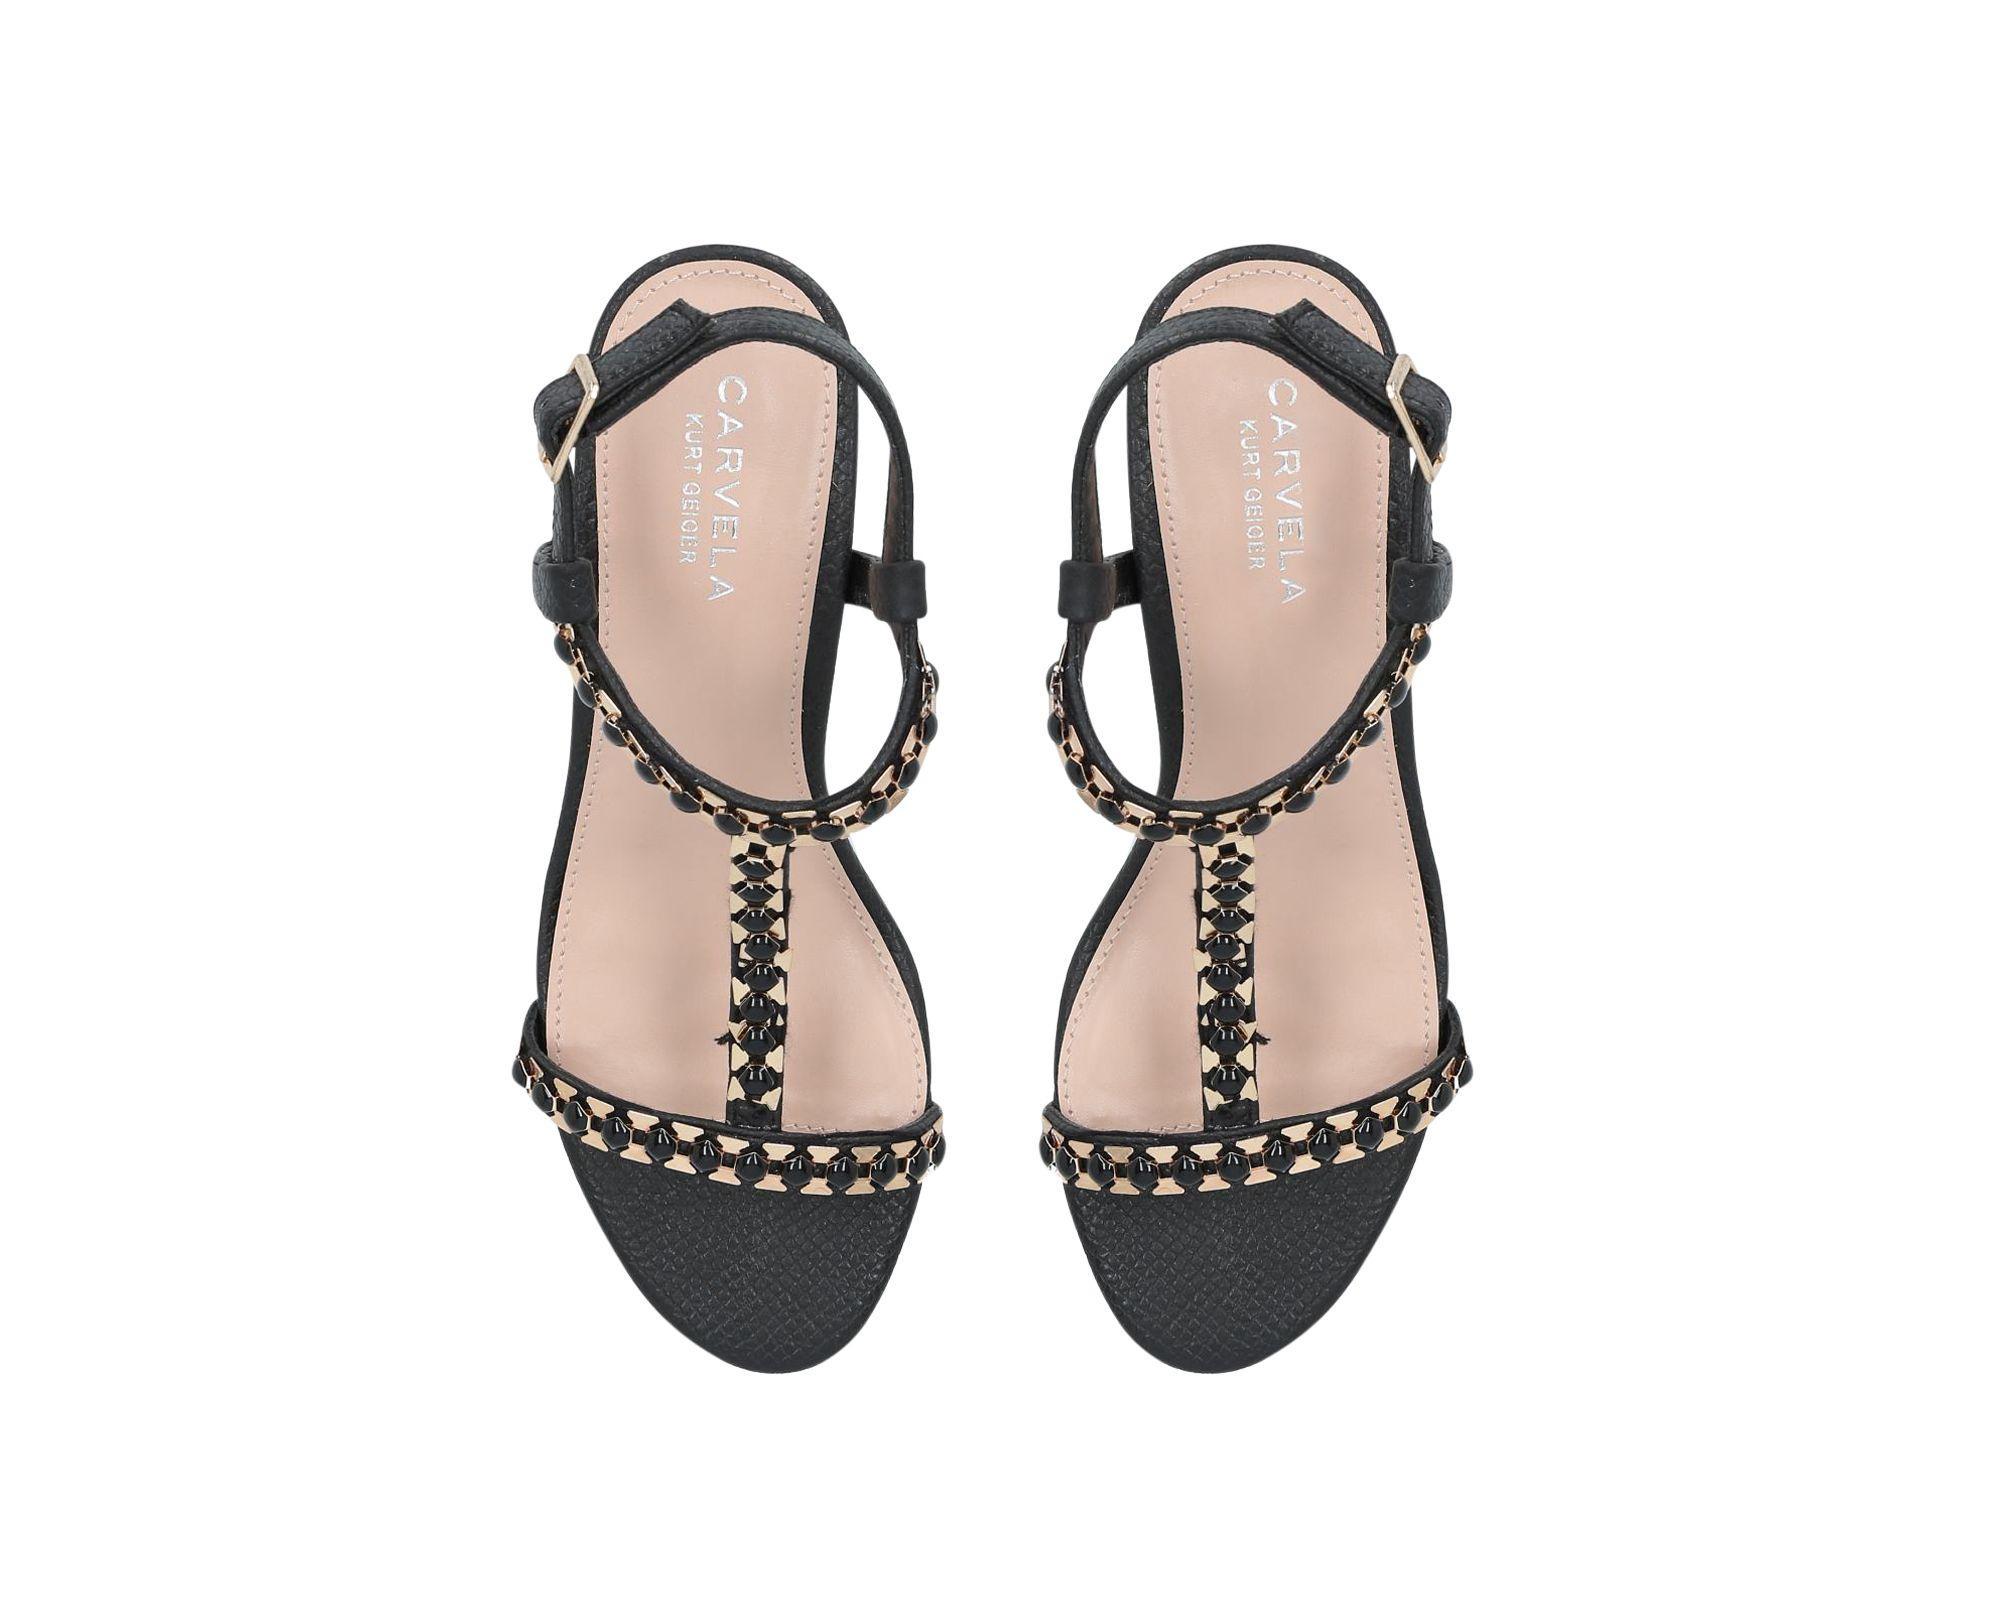 01e00cbc7 Carvela Kurt Geiger 'blazen' Mid Heel Sandals in Black - Save 59% - Lyst